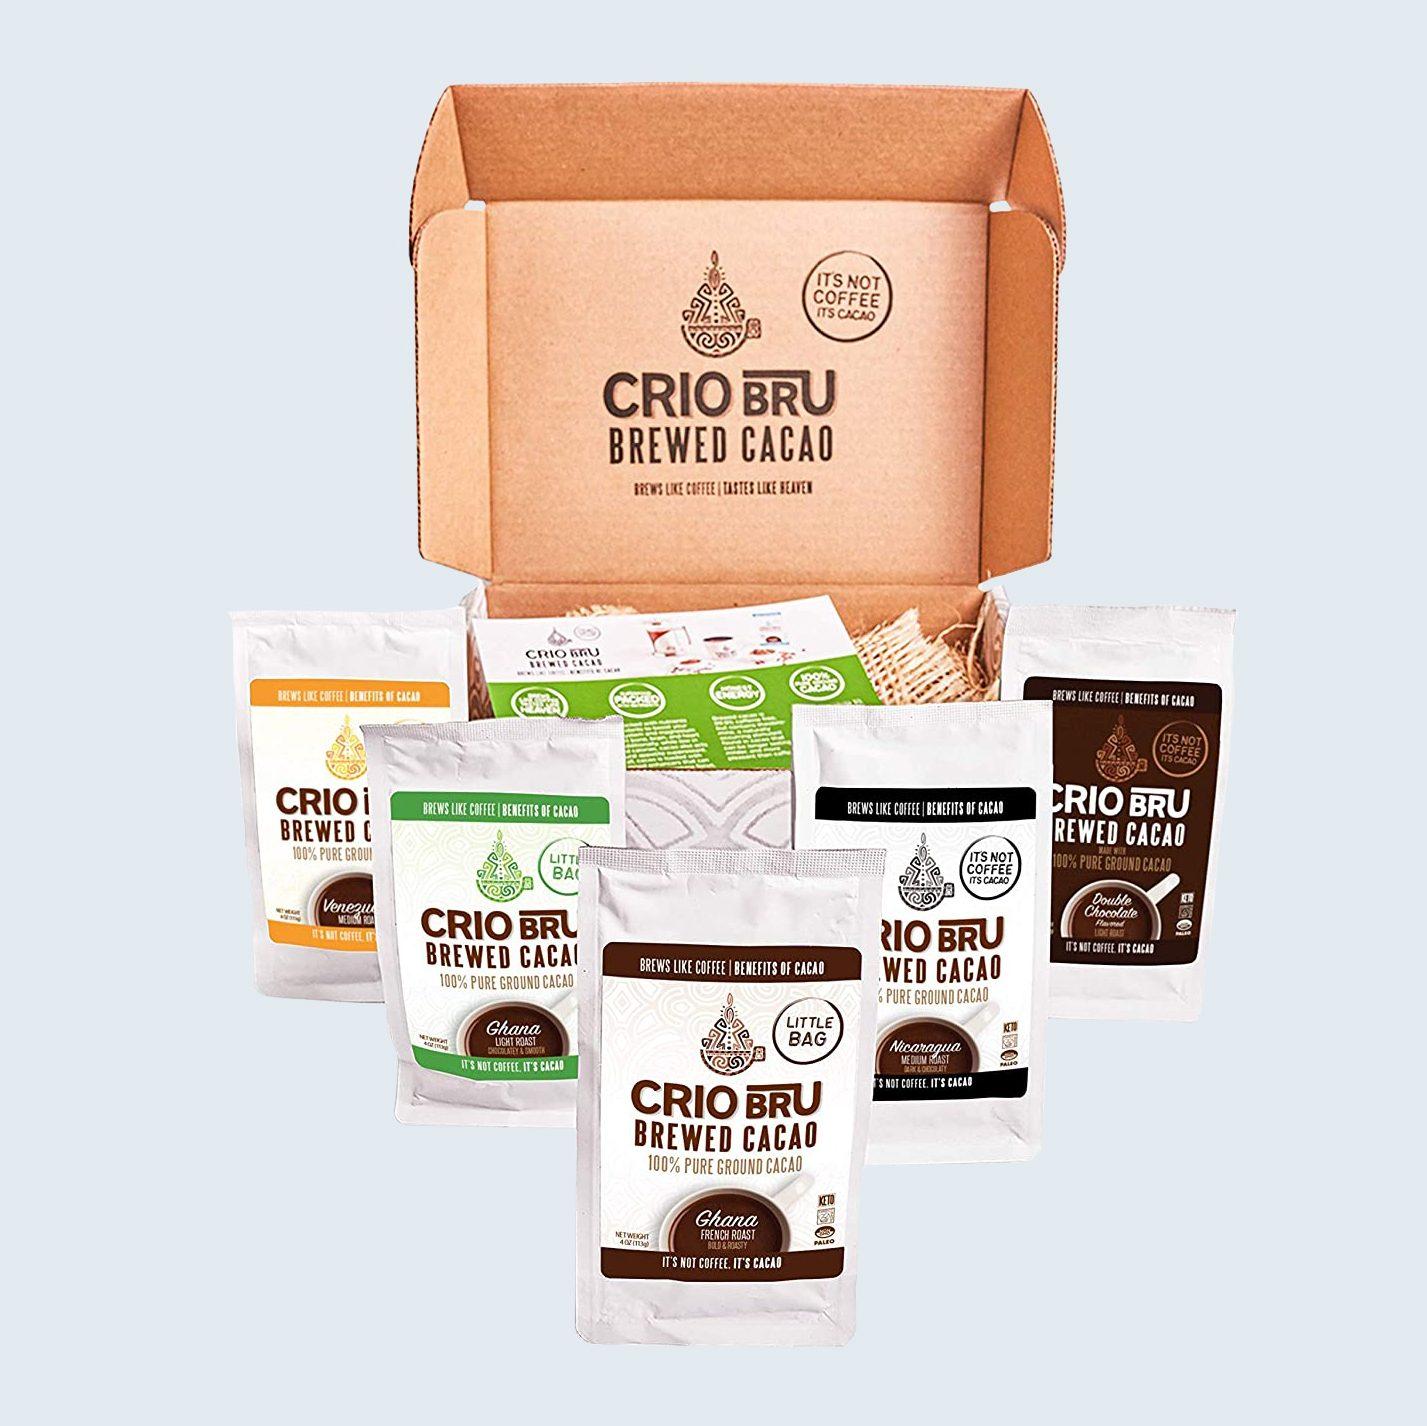 Crio bru Brewed cacao